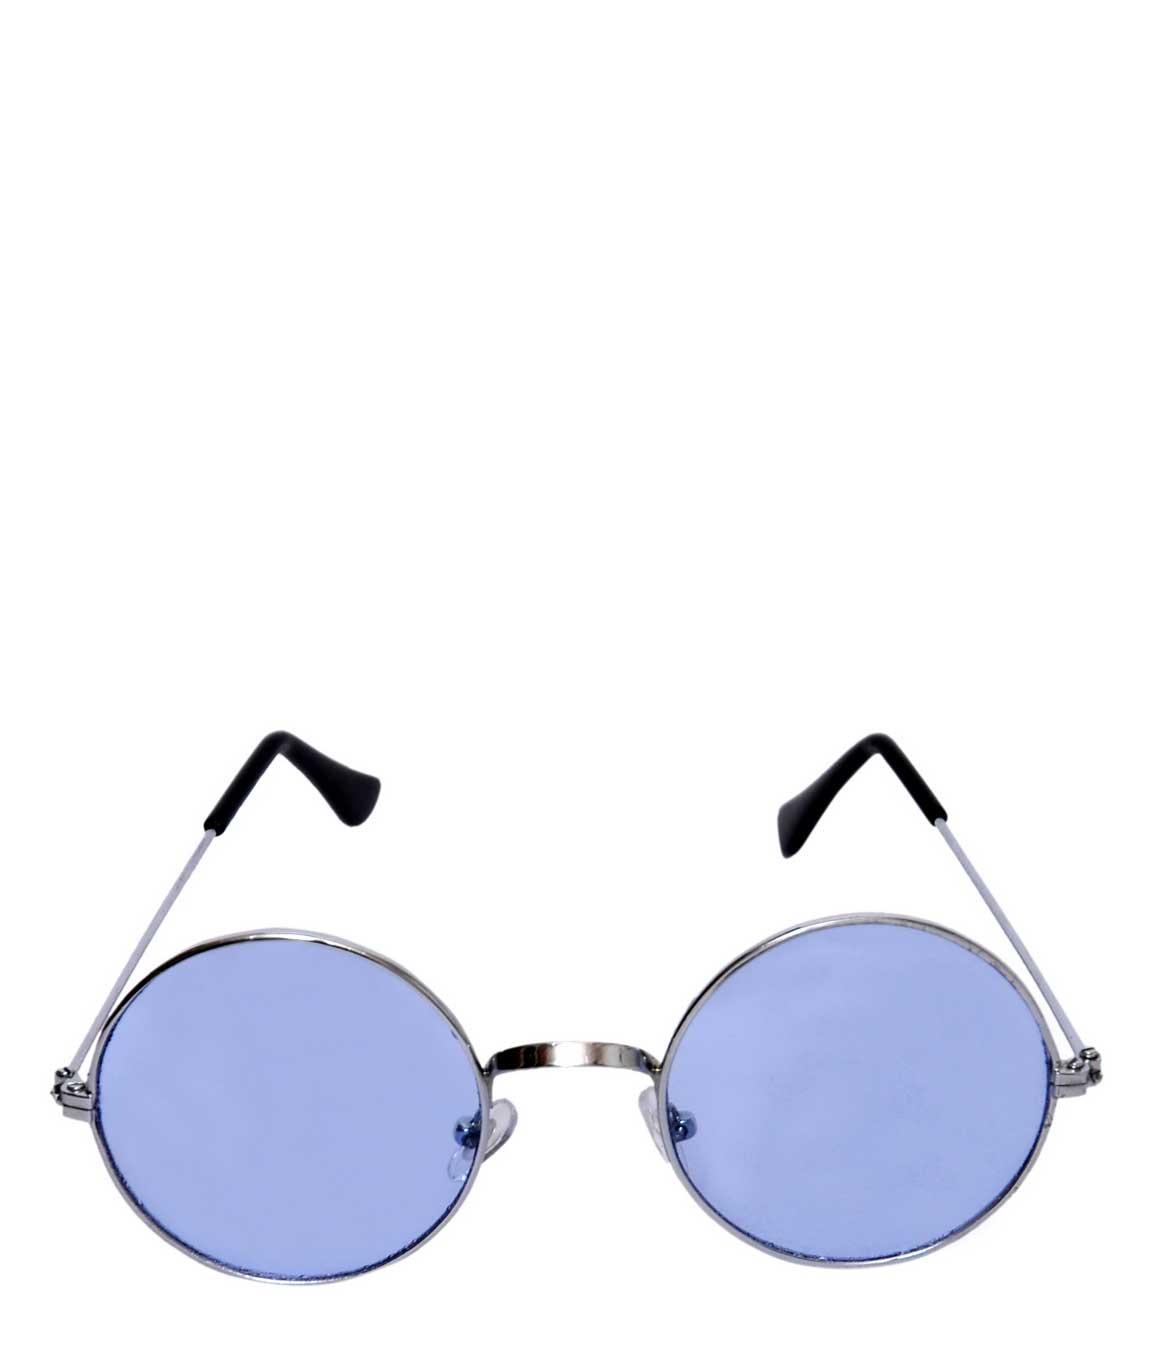 BLUE ROUND GLASSES1